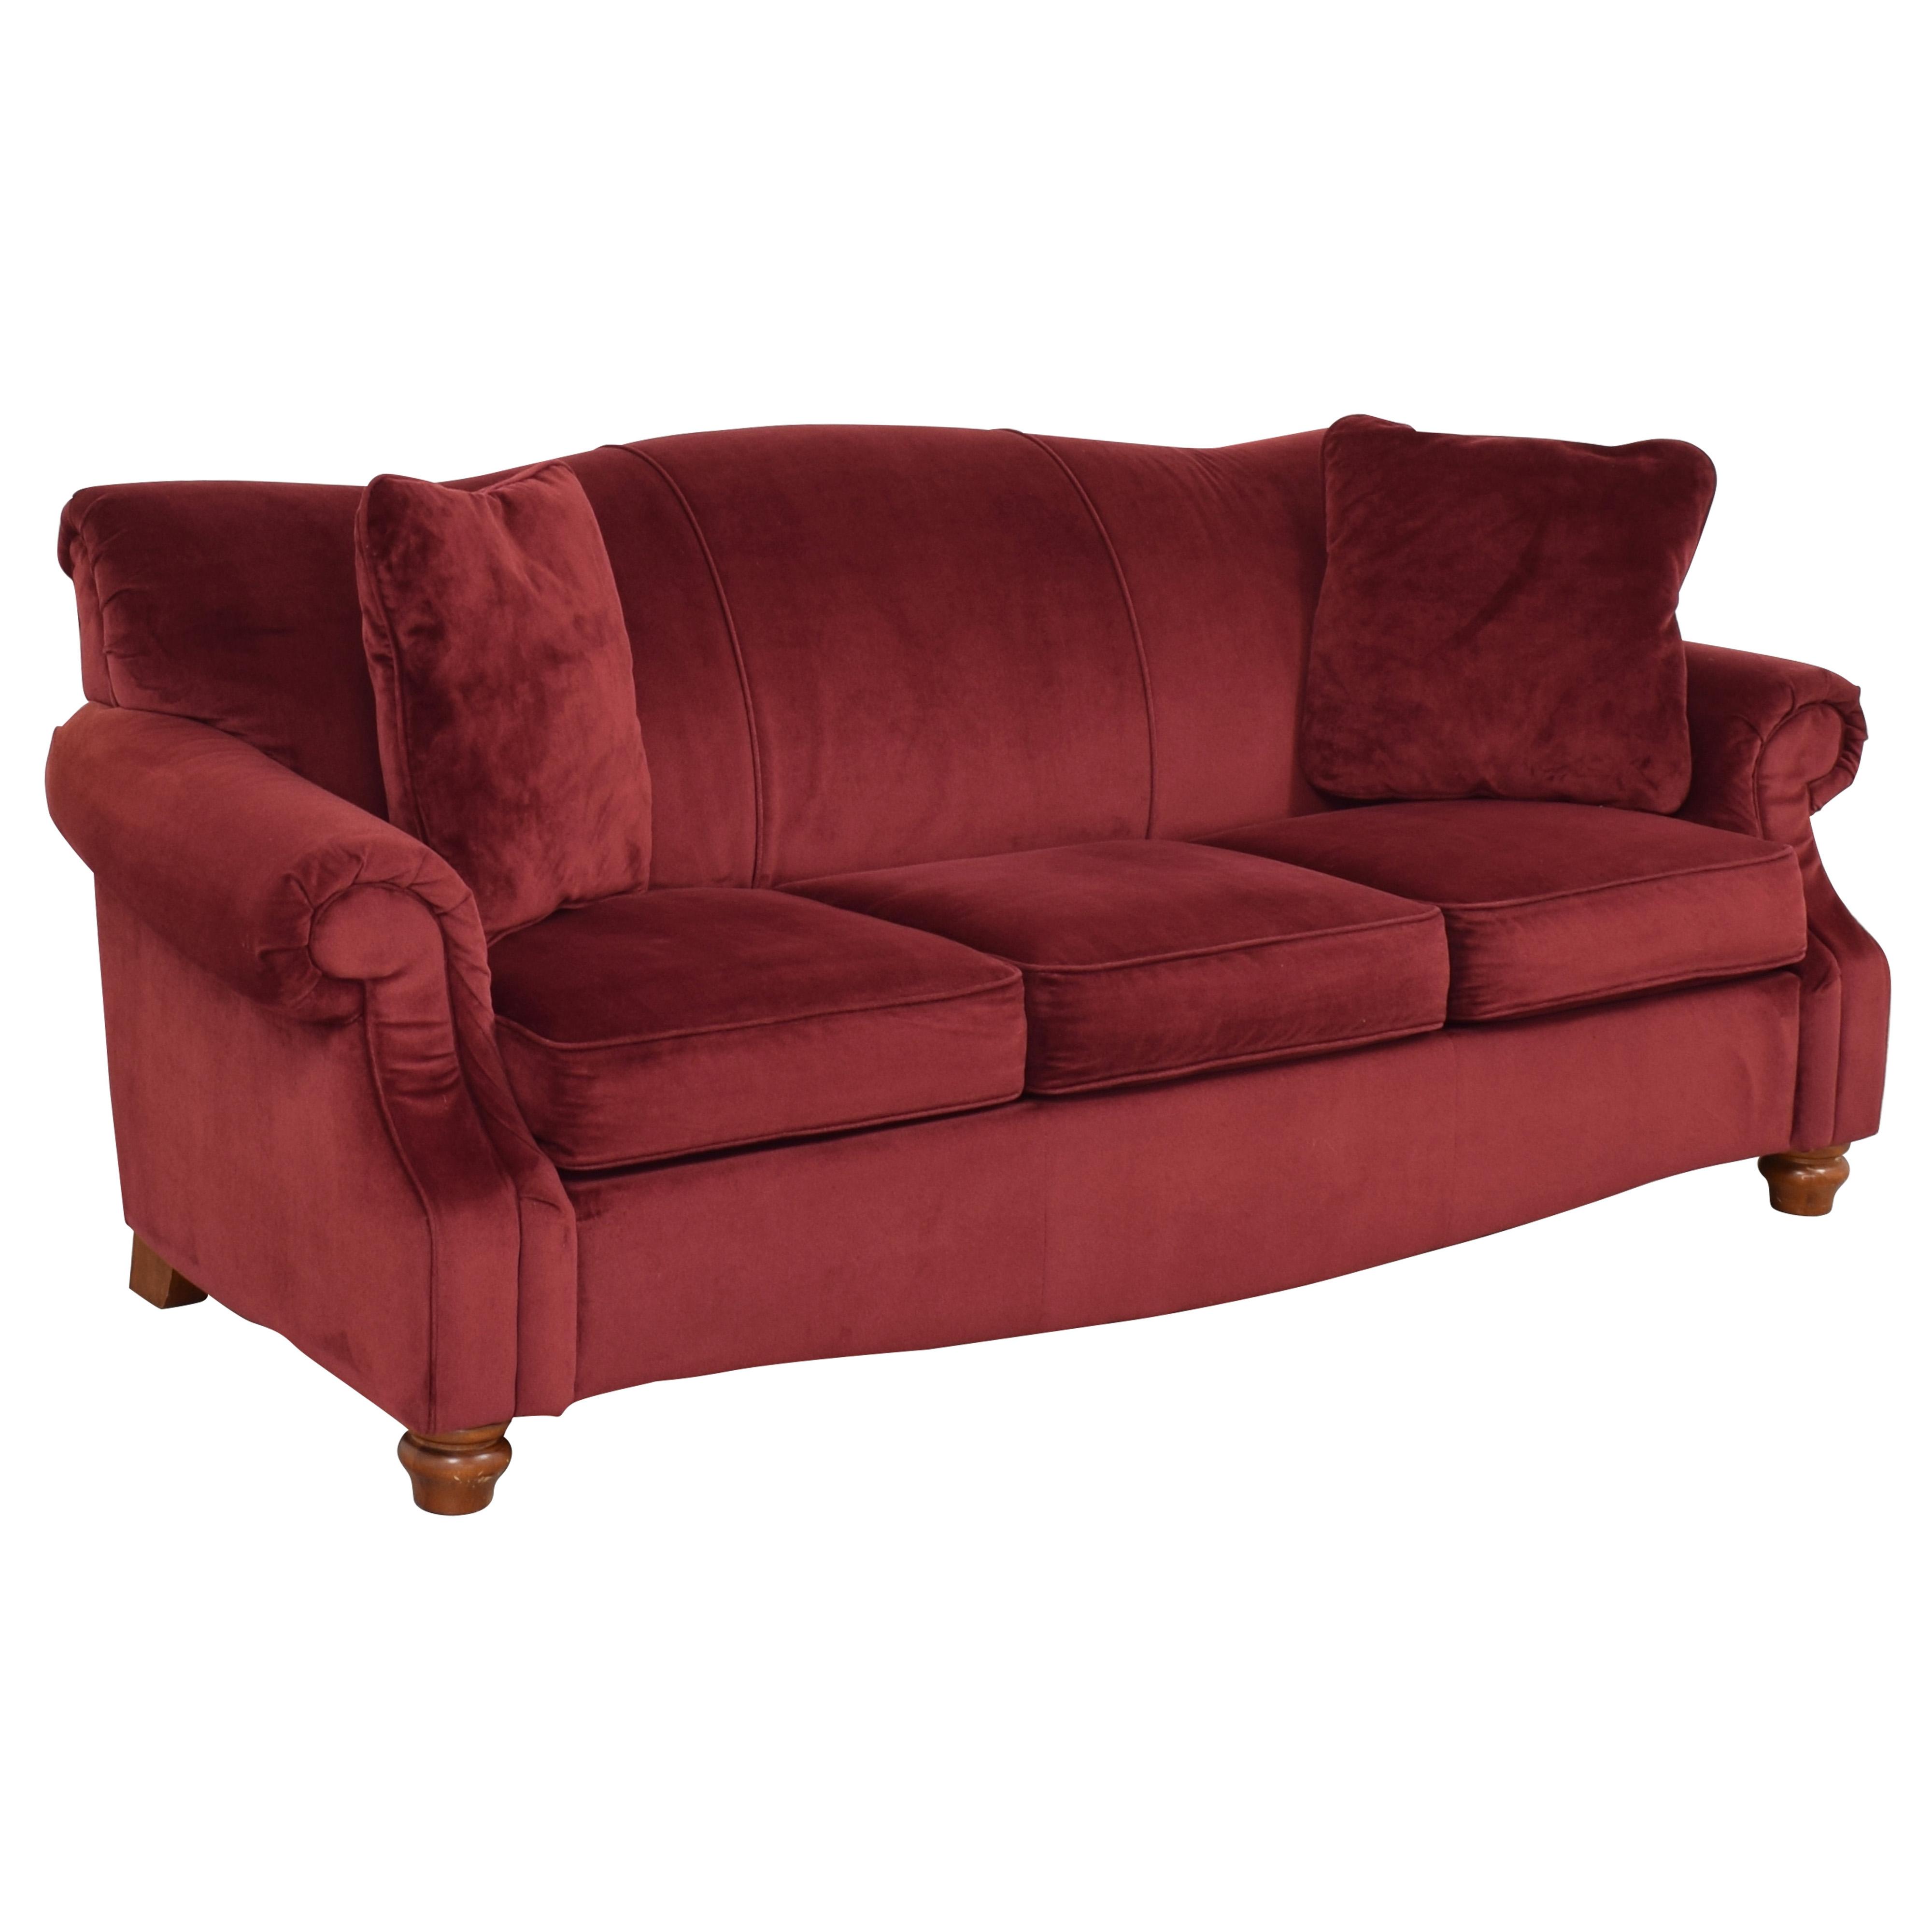 La-Z-Boy La-Z-Boy Traditional Sofa discount